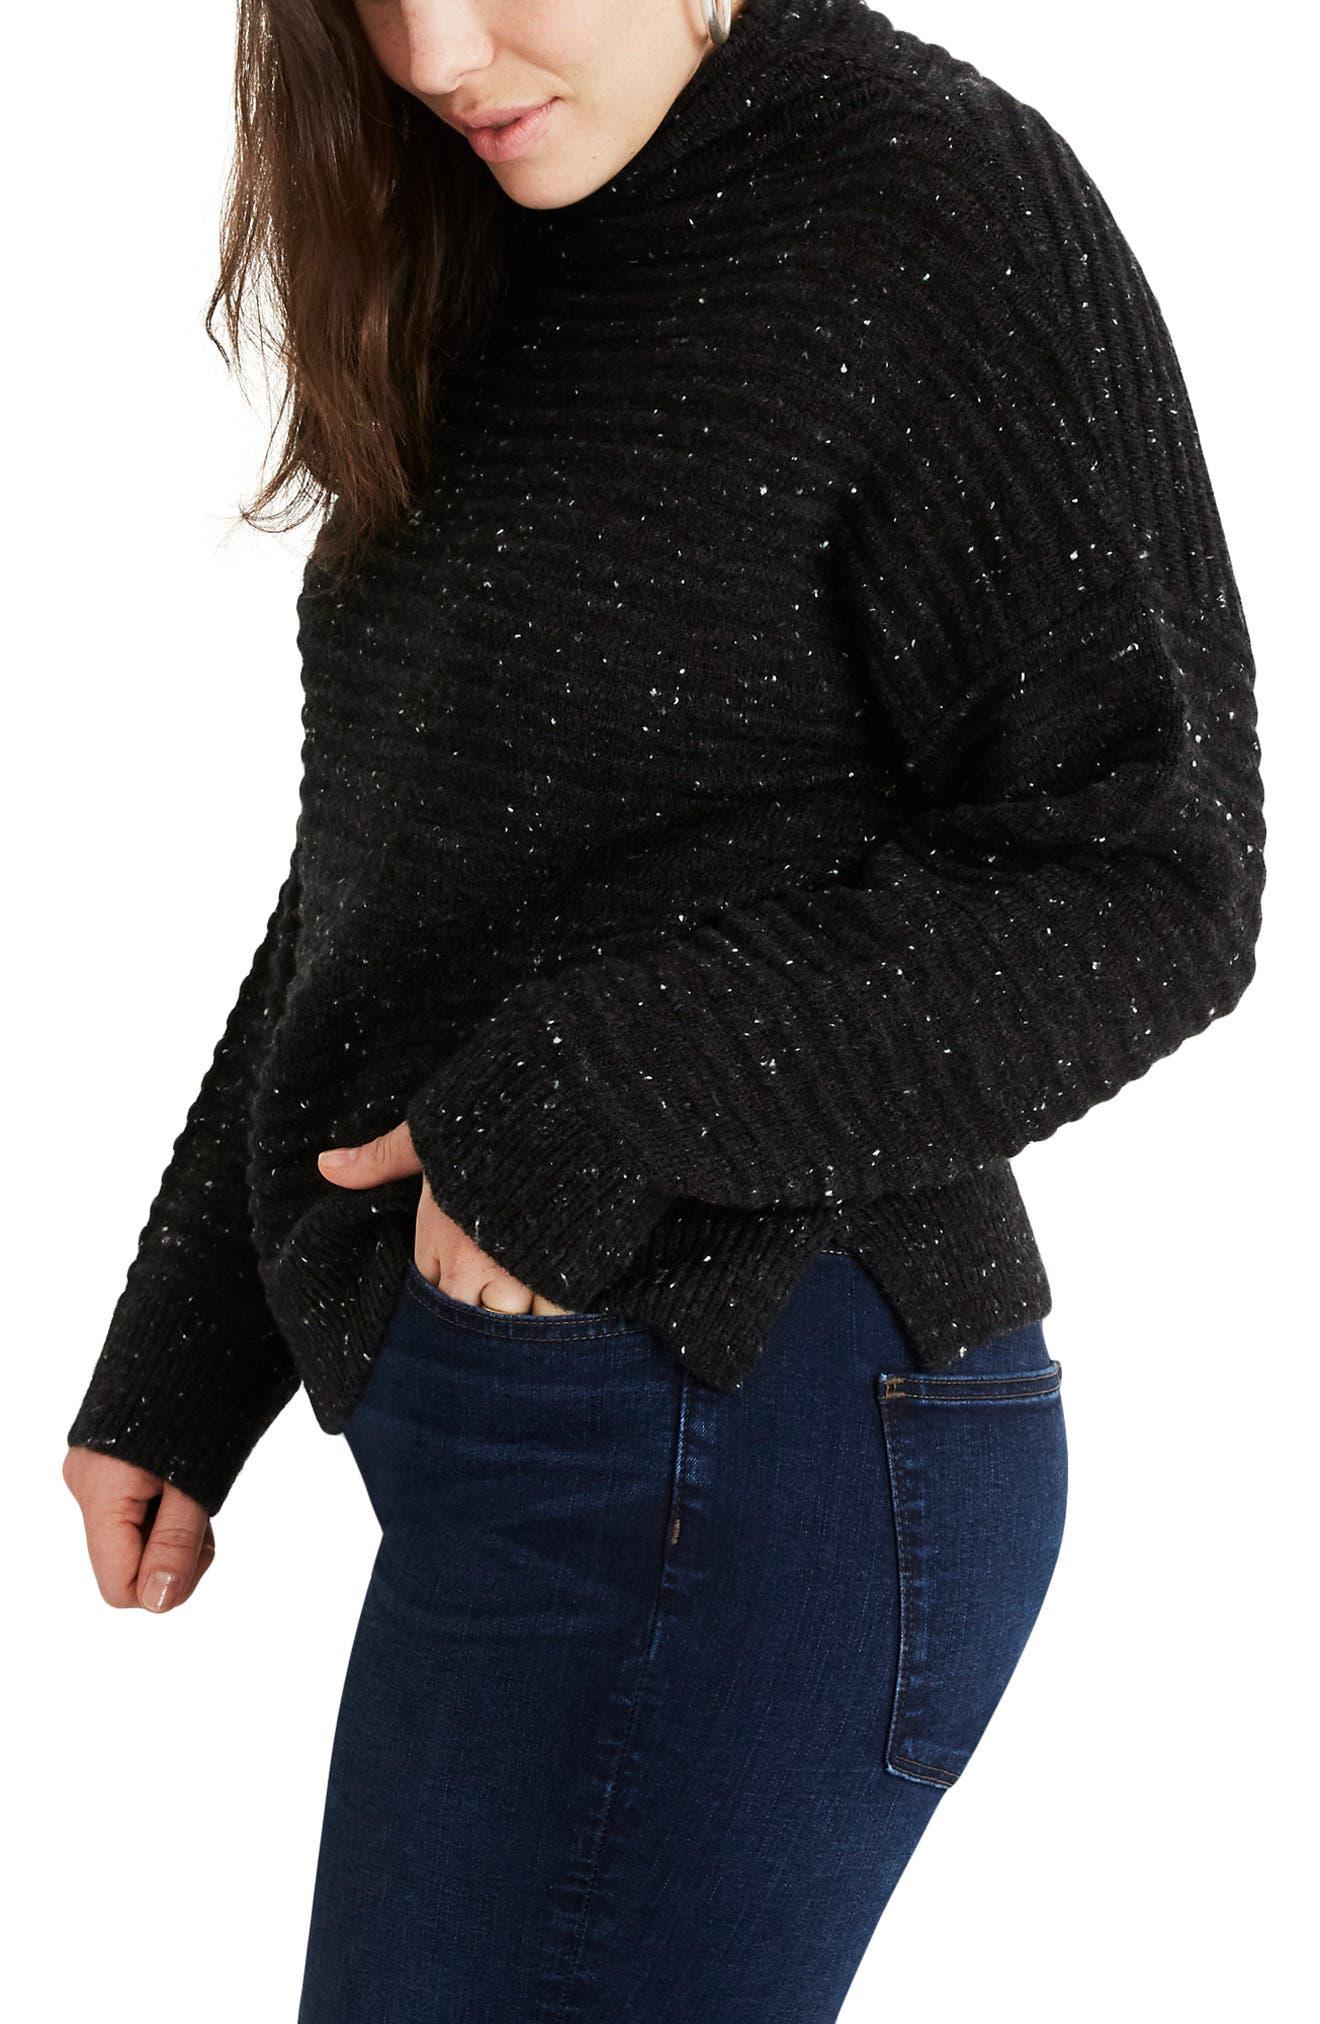 Belmont Donegal Mock Neck Sweater,                             Alternate thumbnail 8, color,                             DONEGAL STORM